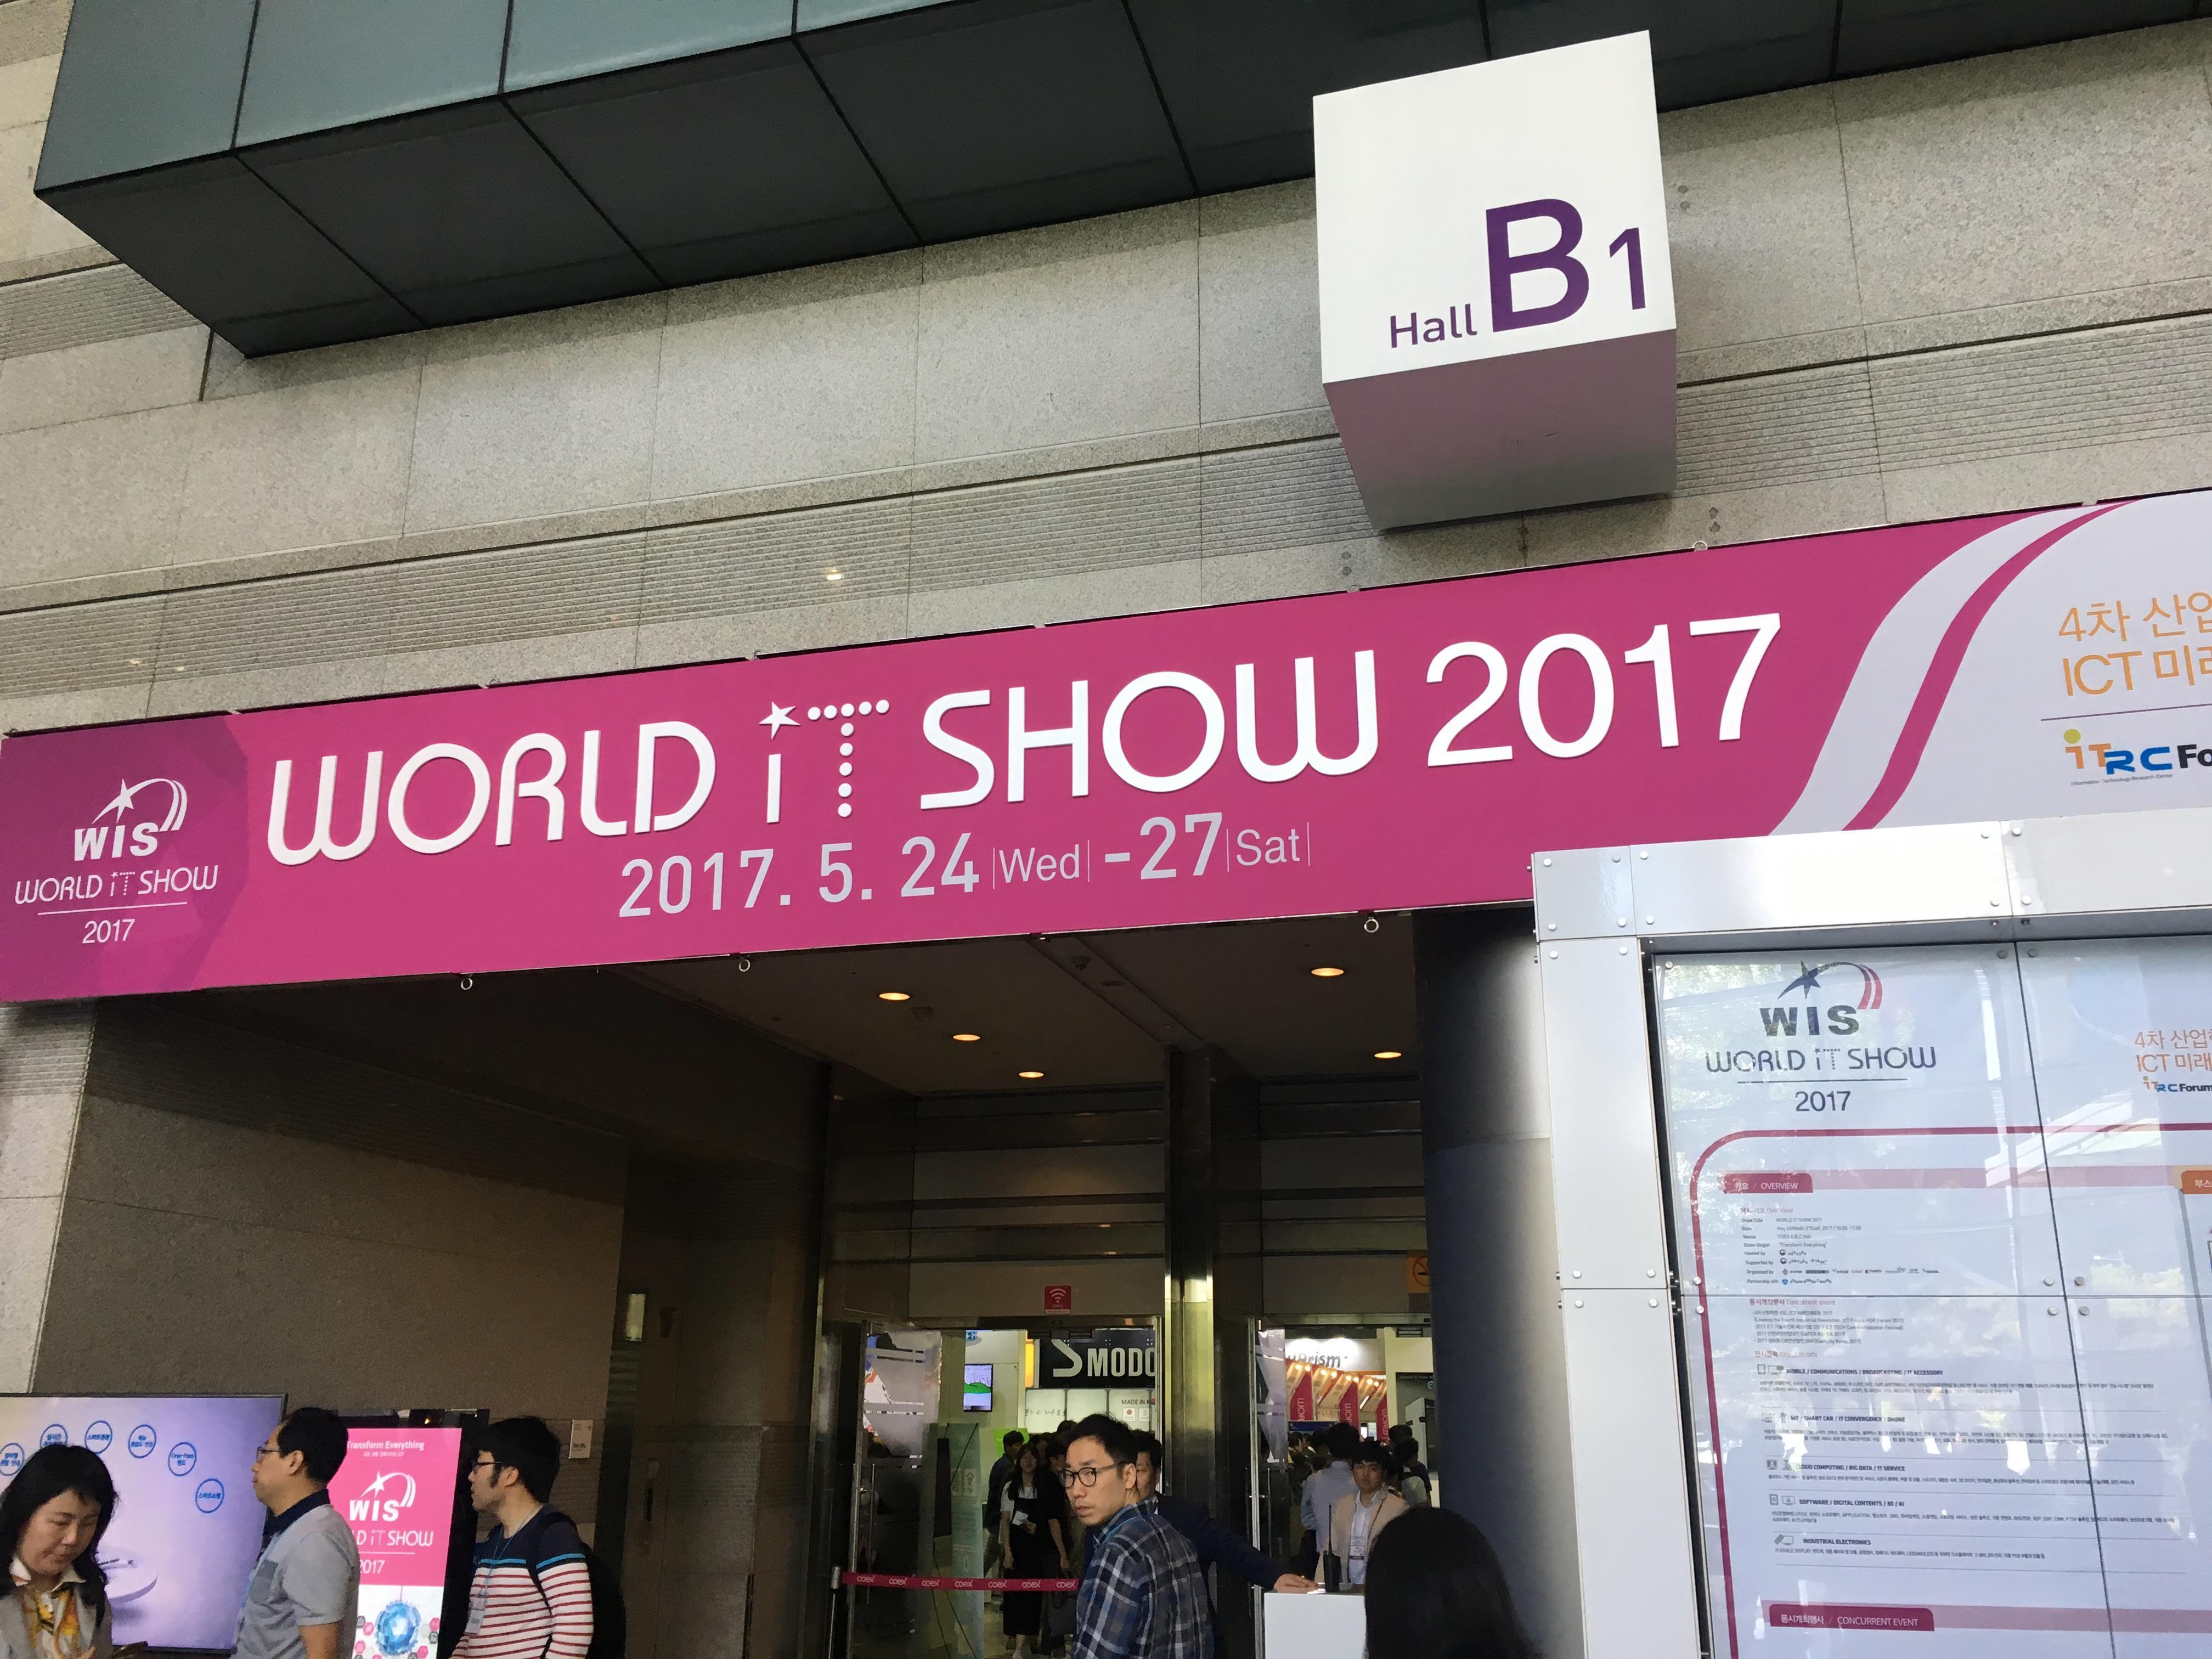 World IT Show 2017